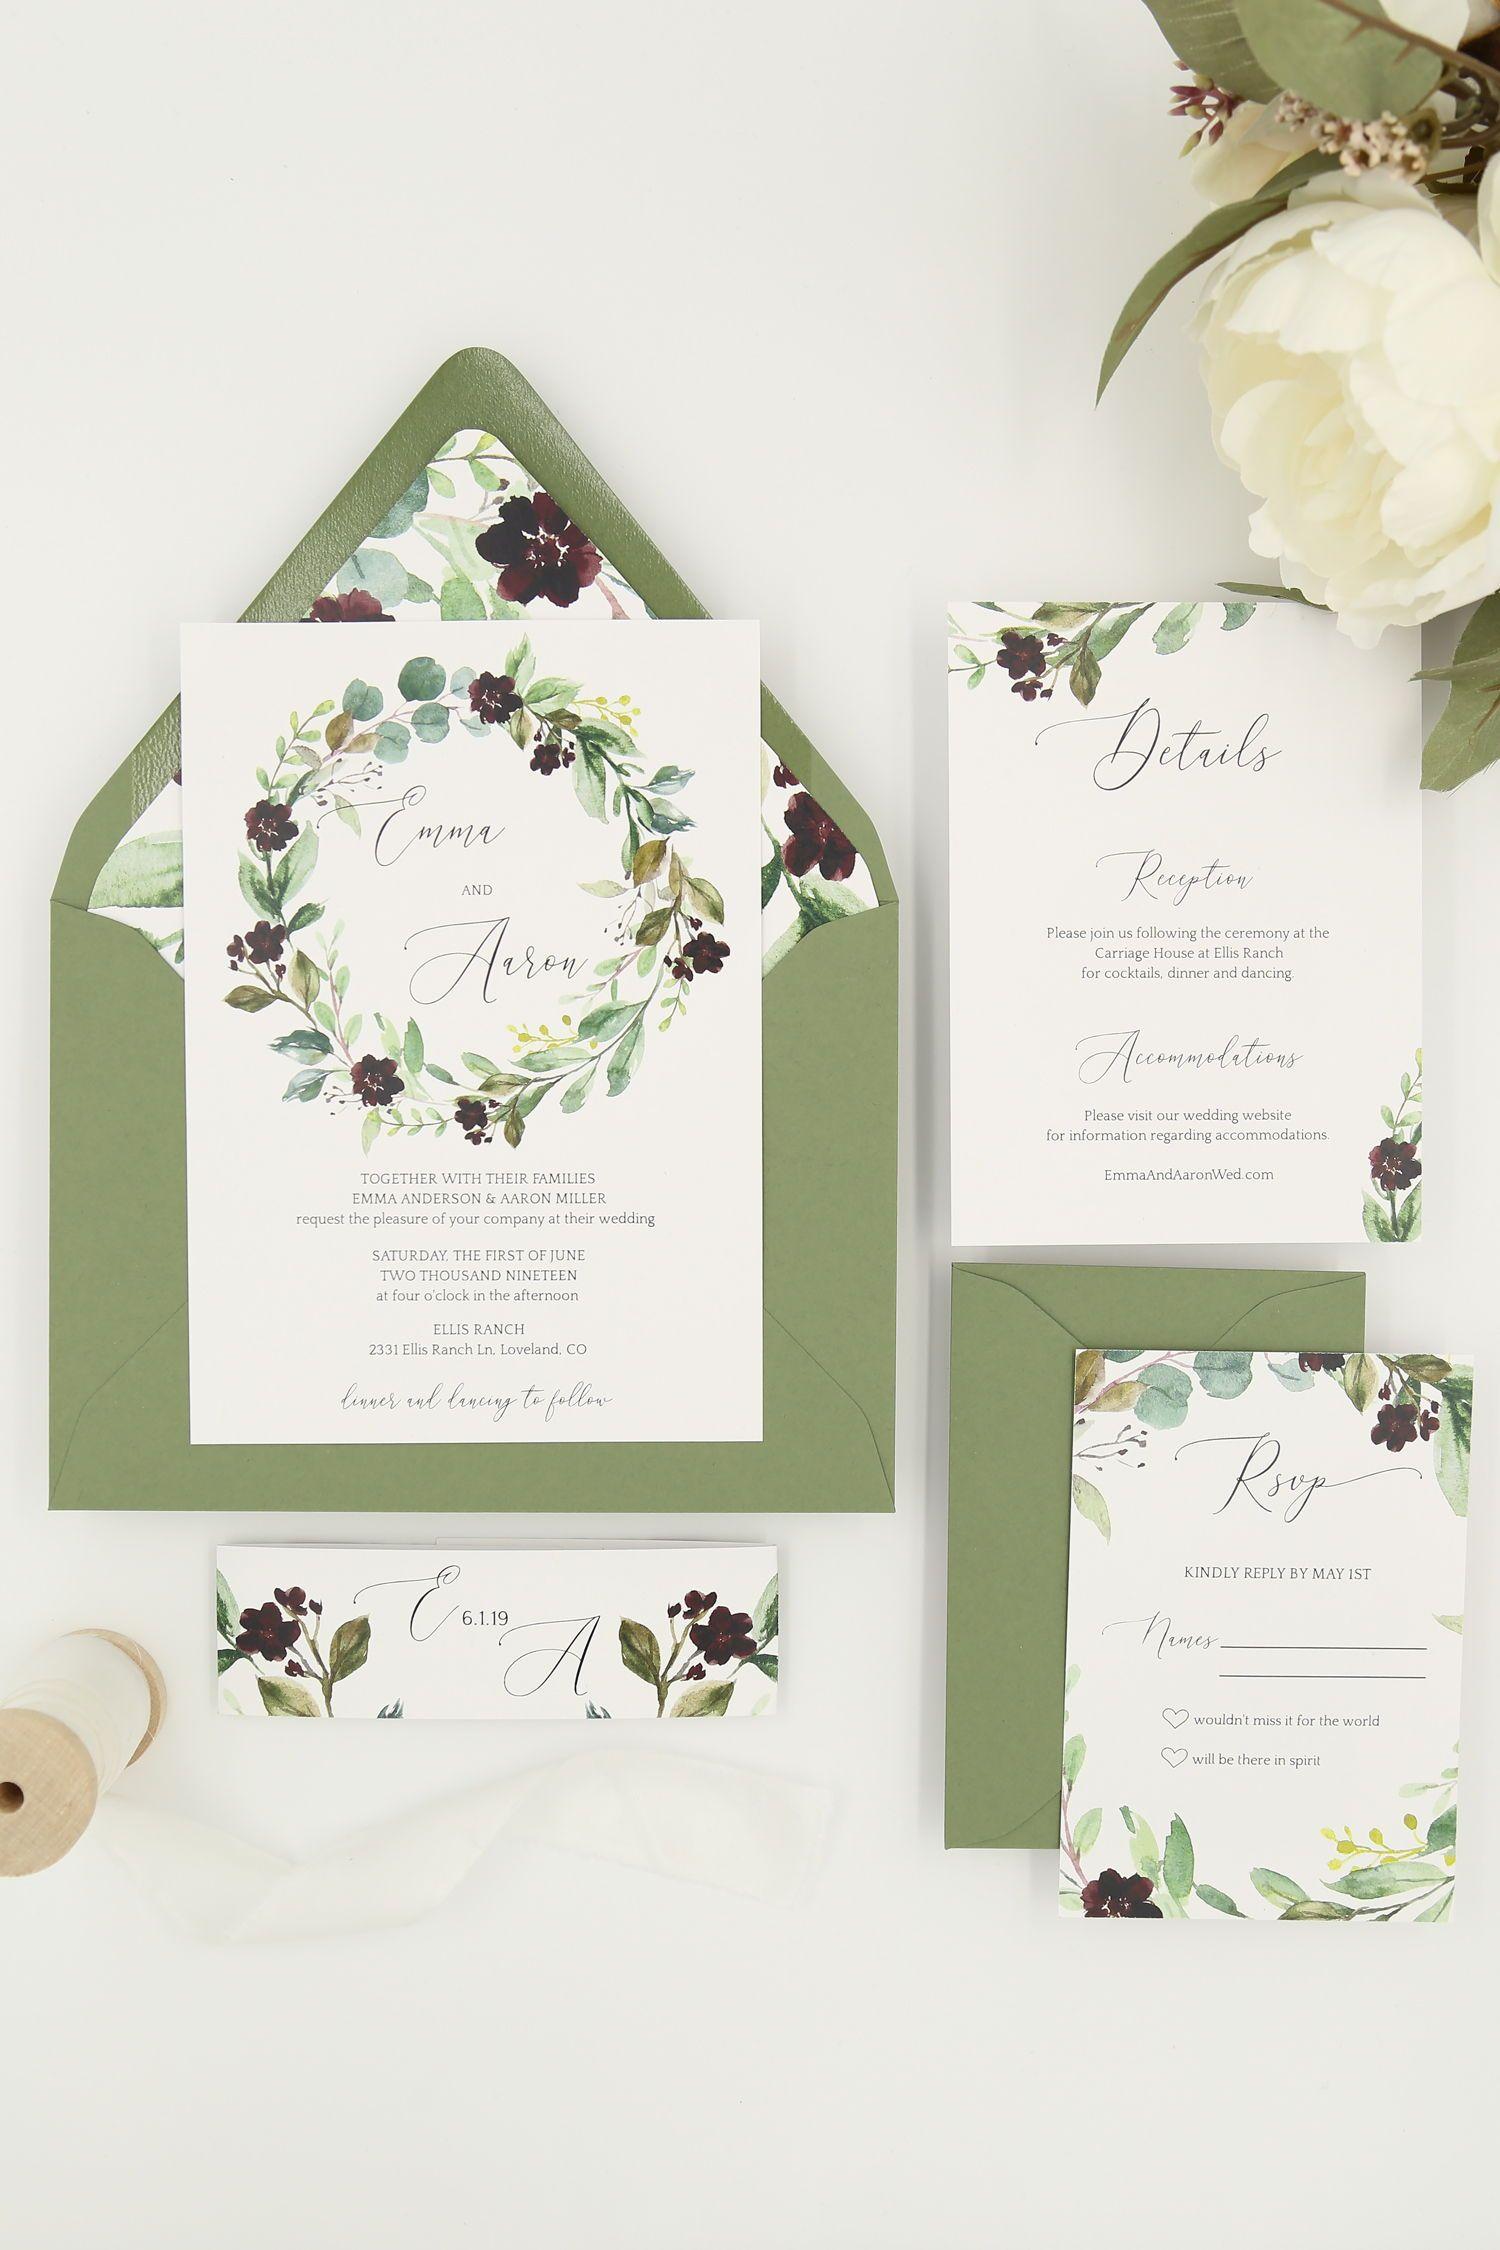 Greenery Wedding Invitation Template Printable Wedding Etsy In 2020 Printable Wedding Invitations Wedding Invitations Wedding Invitation Templates